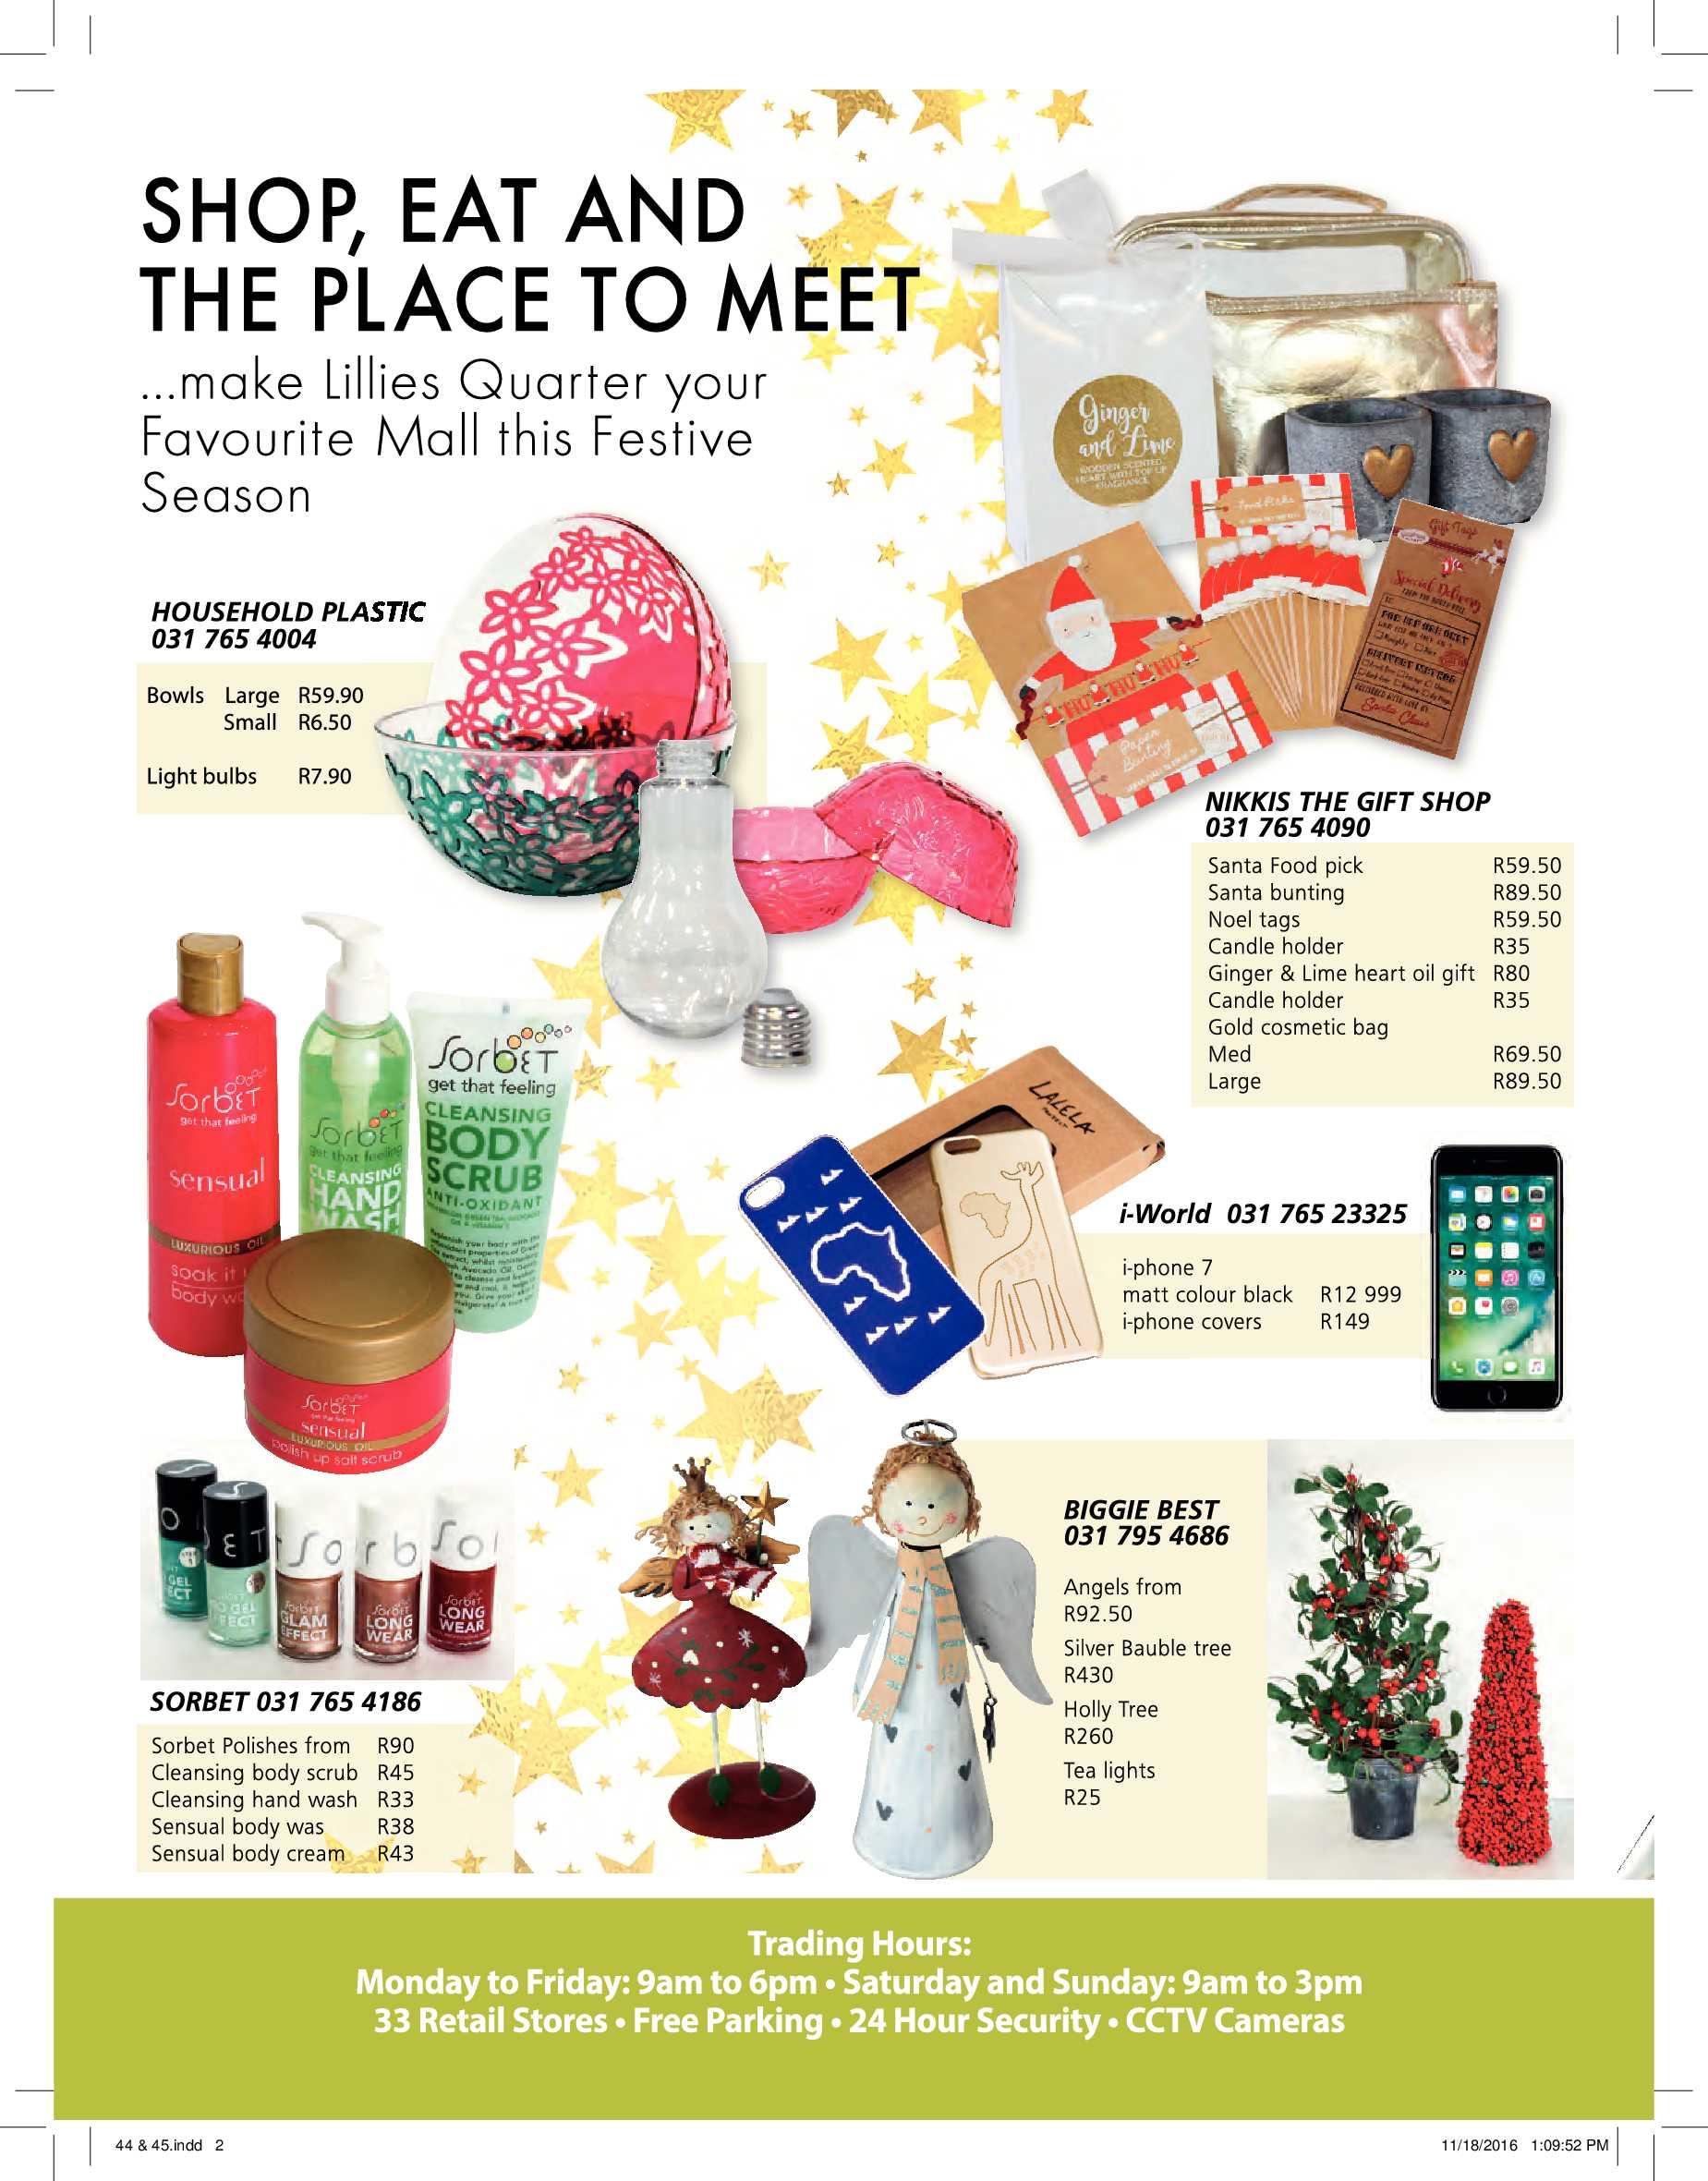 durban-get-it-magazine-december-2016-epapers-page-46